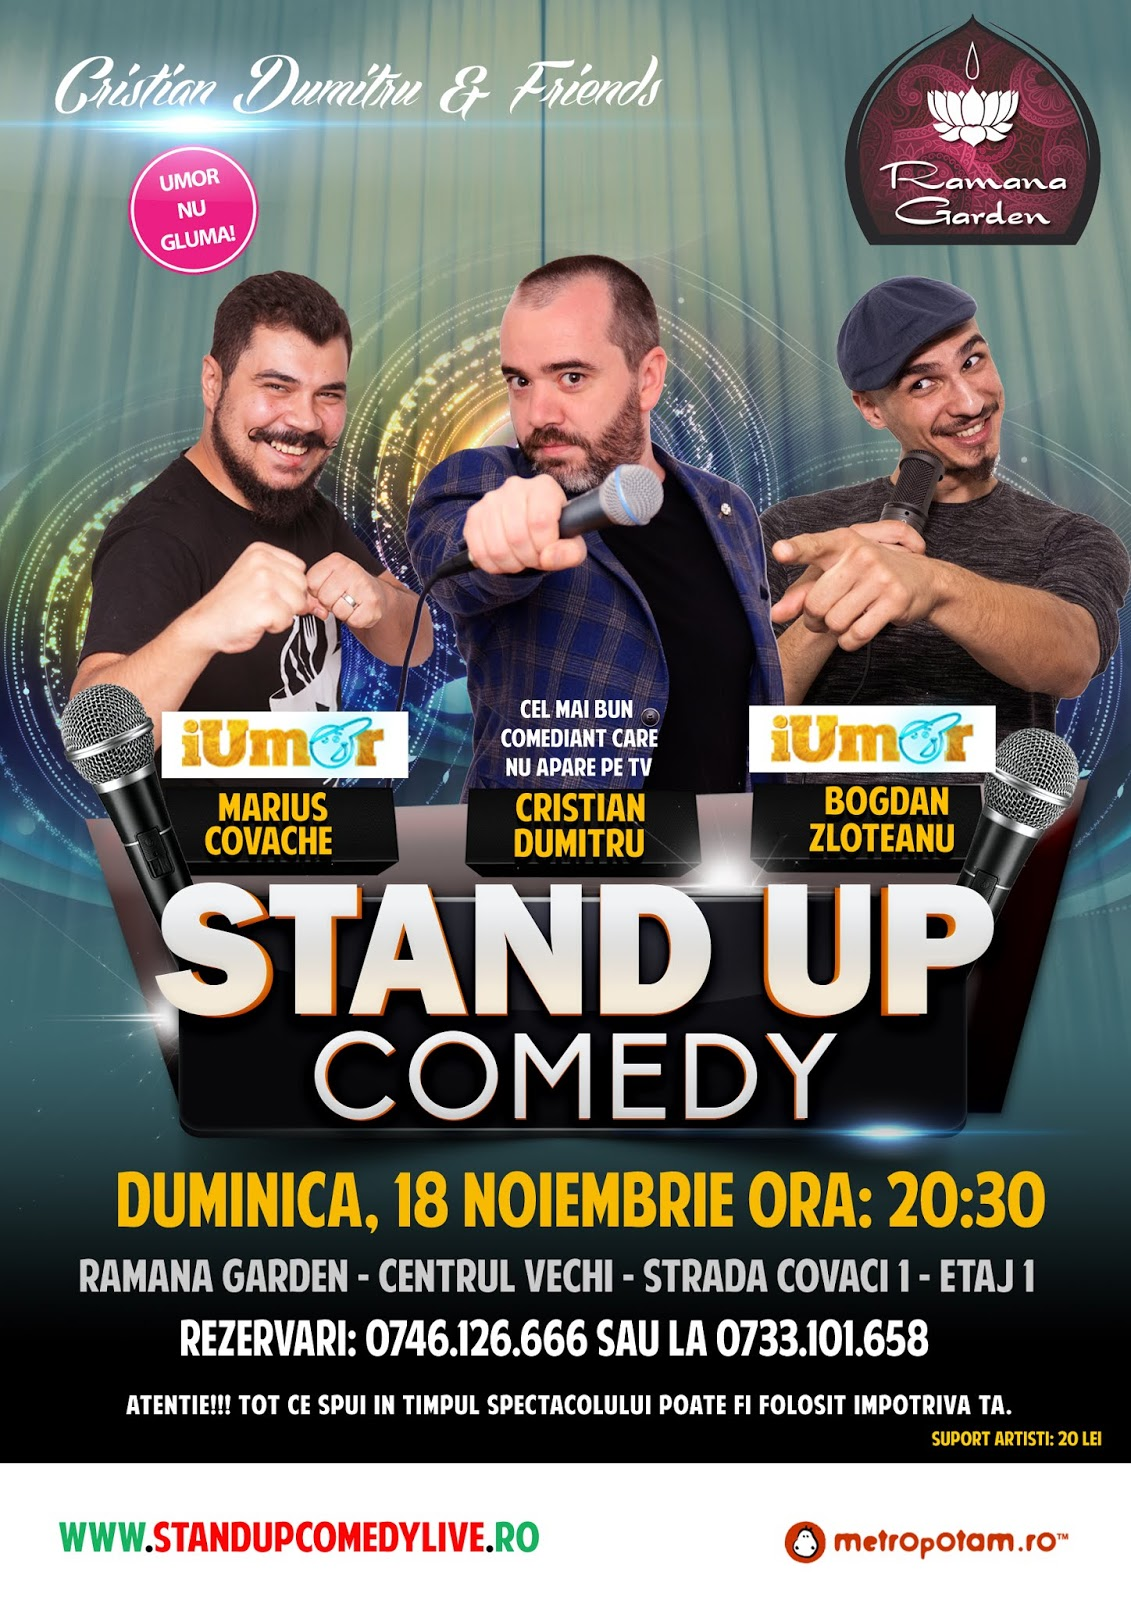 Stand-Up Comedy Duminica 18 Noiembrie Bucuresti